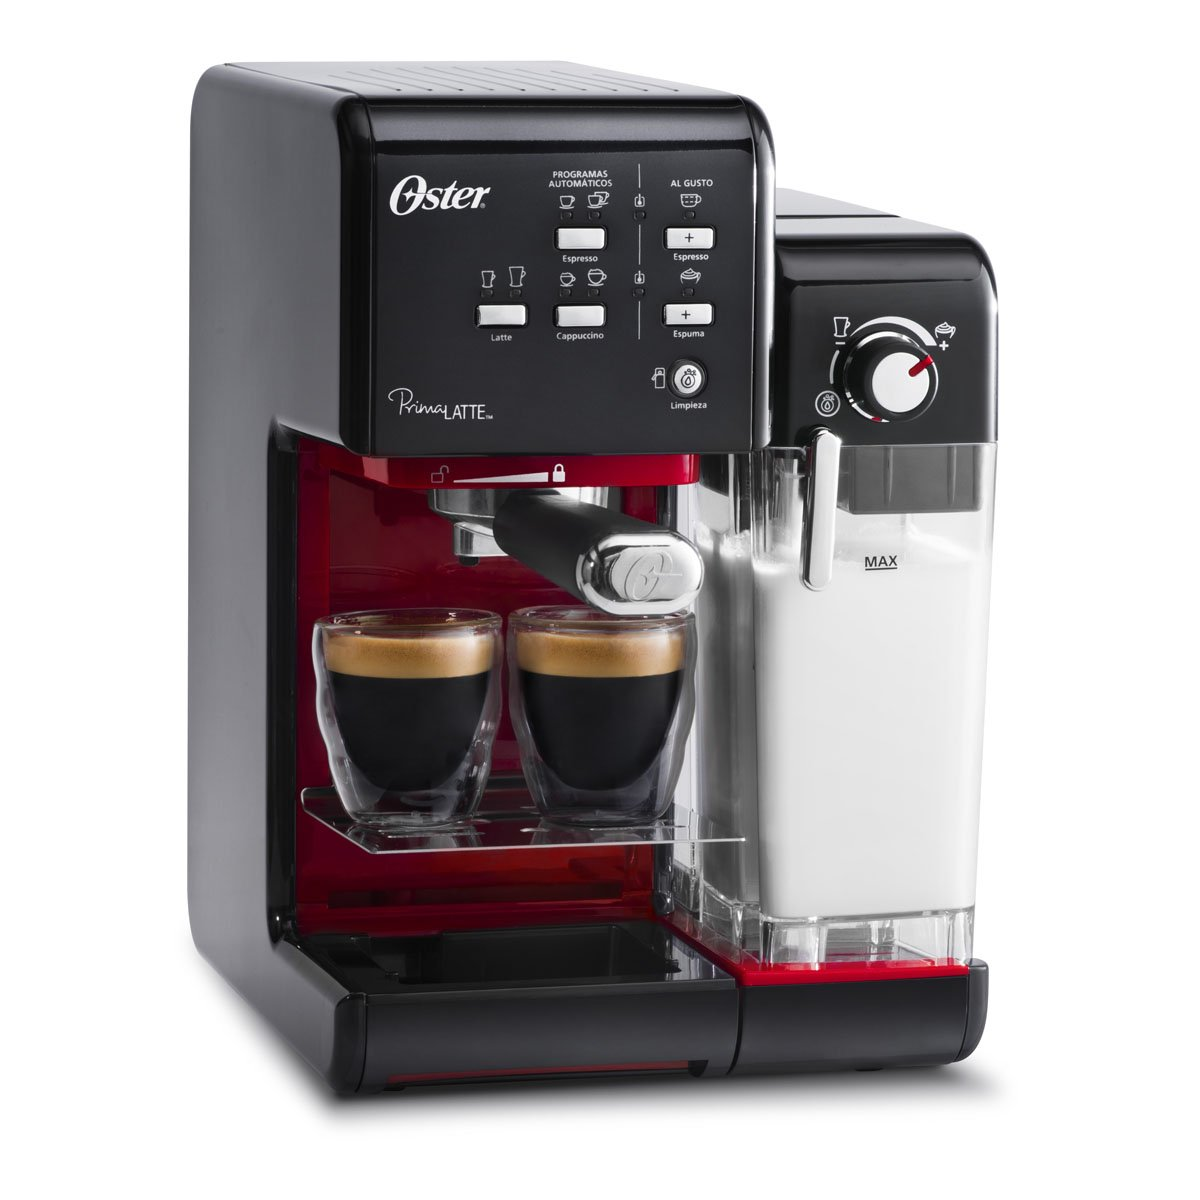 Cafetera espresso capuchino prima latte negra bvst oster - Cafetera express amazon ...